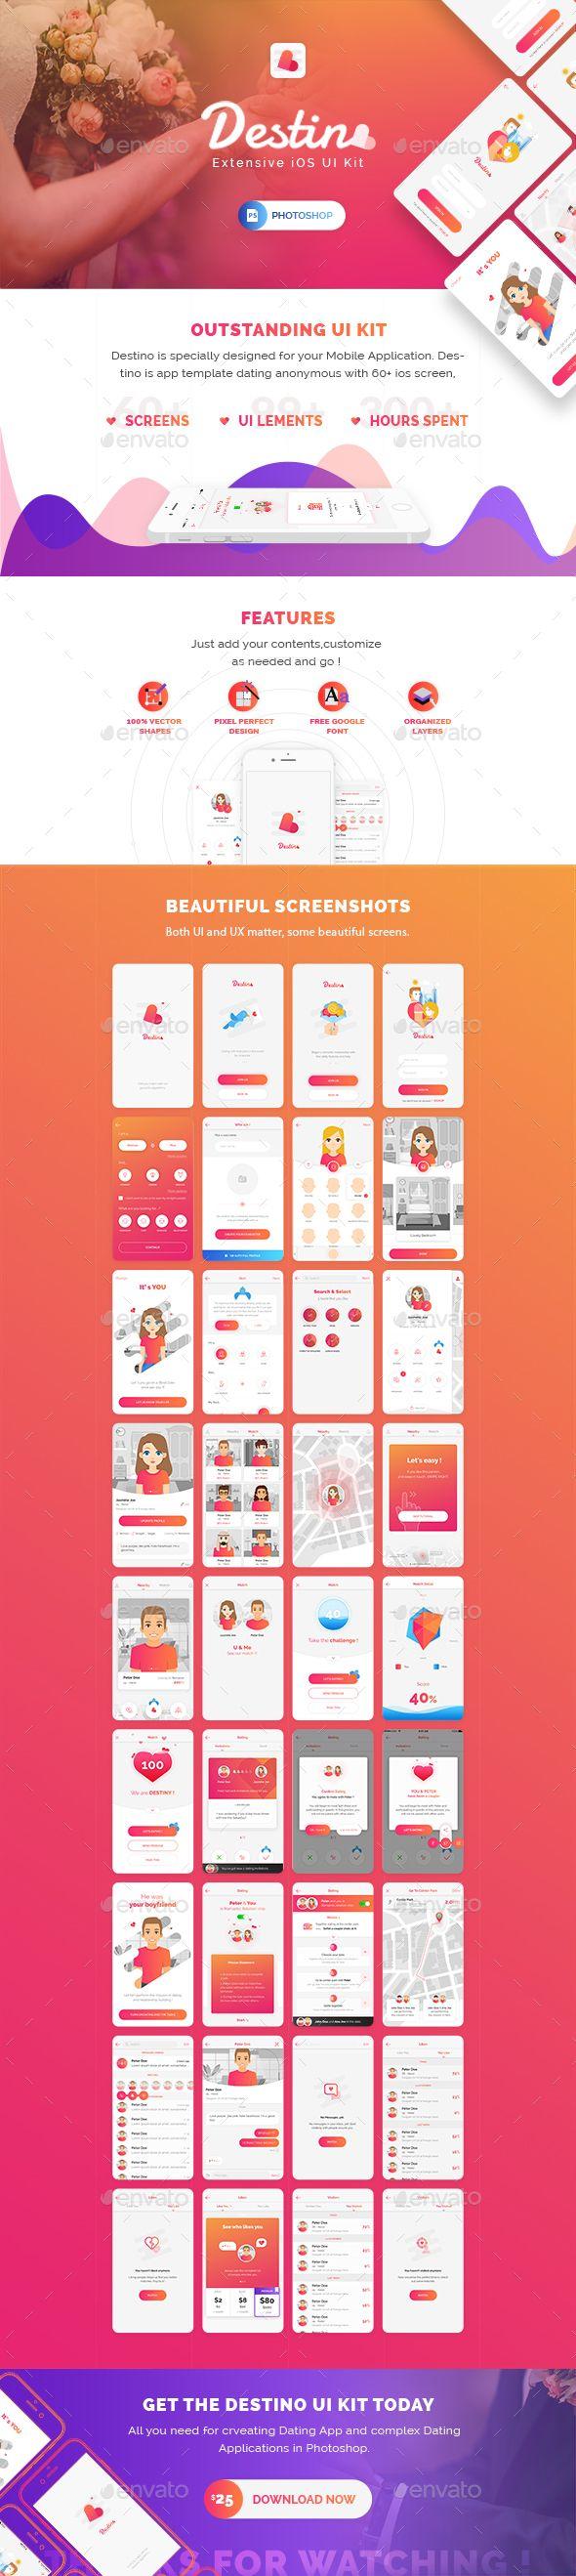 535 best Mobile Interface & App Design images on Pinterest | Ui ...